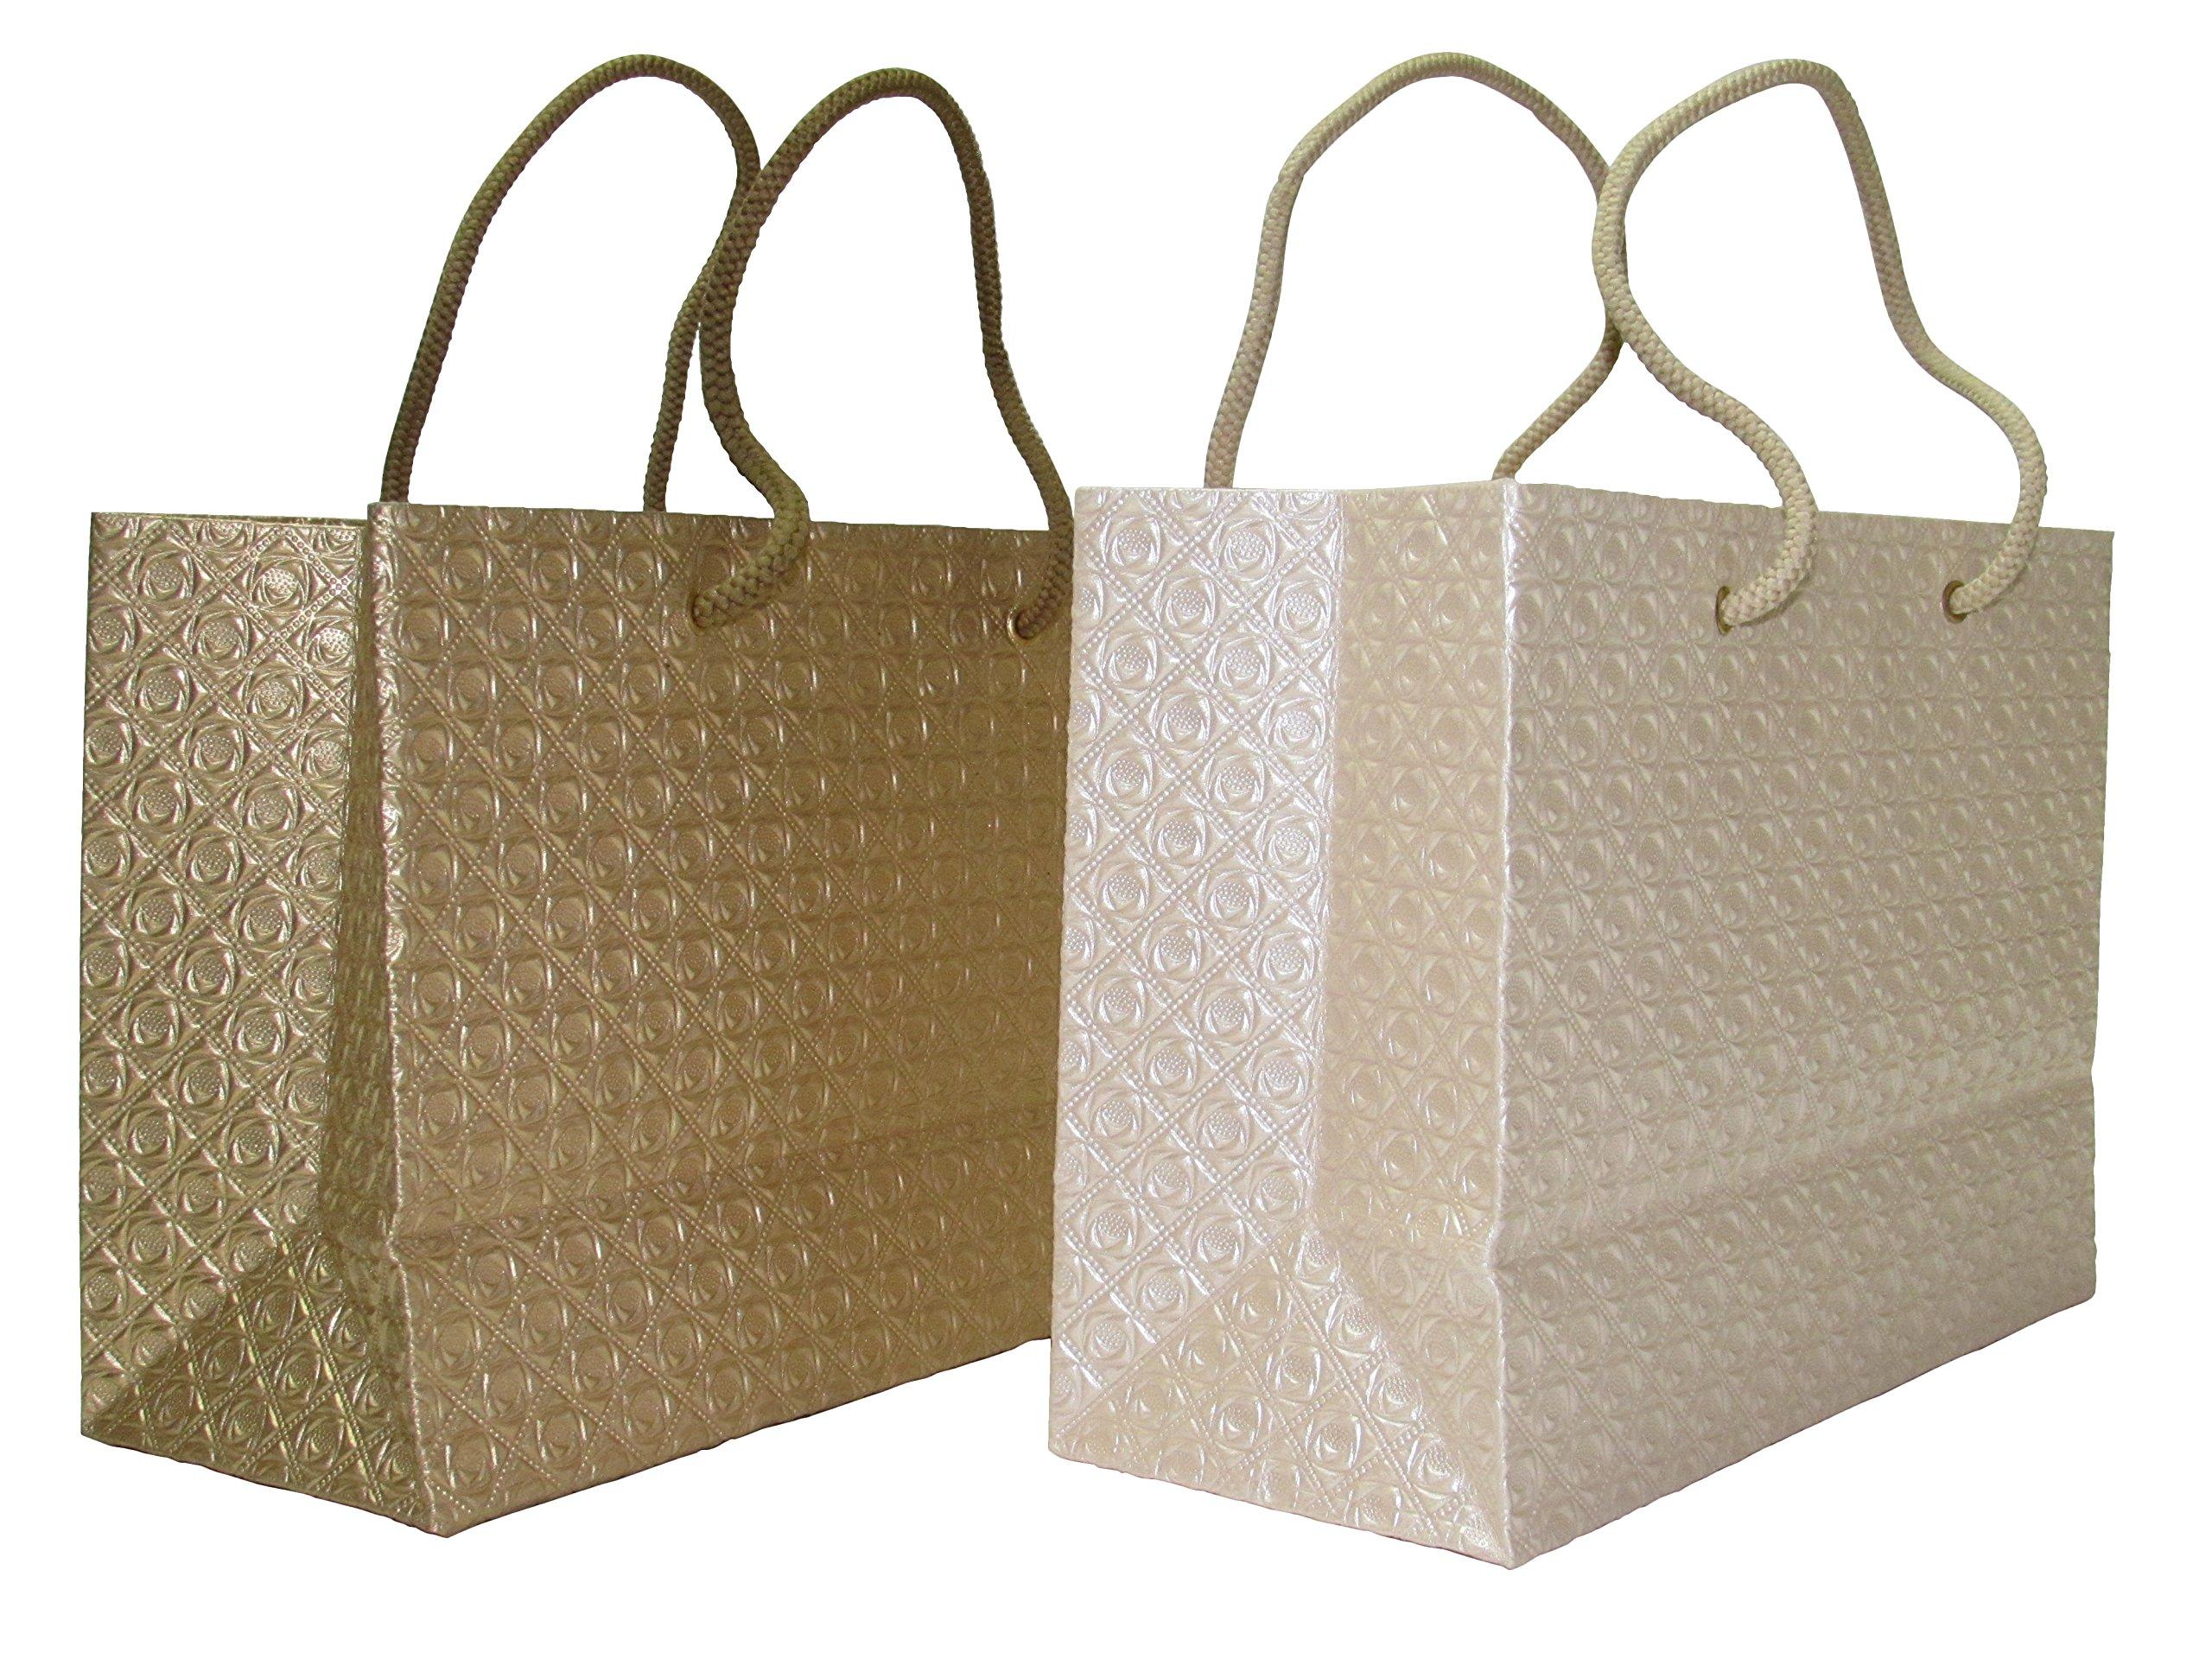 Top Grade Exquisite Embossed Rose Metallic Gift Bags - 2/pk (Gift Bag, Cream/Gold)